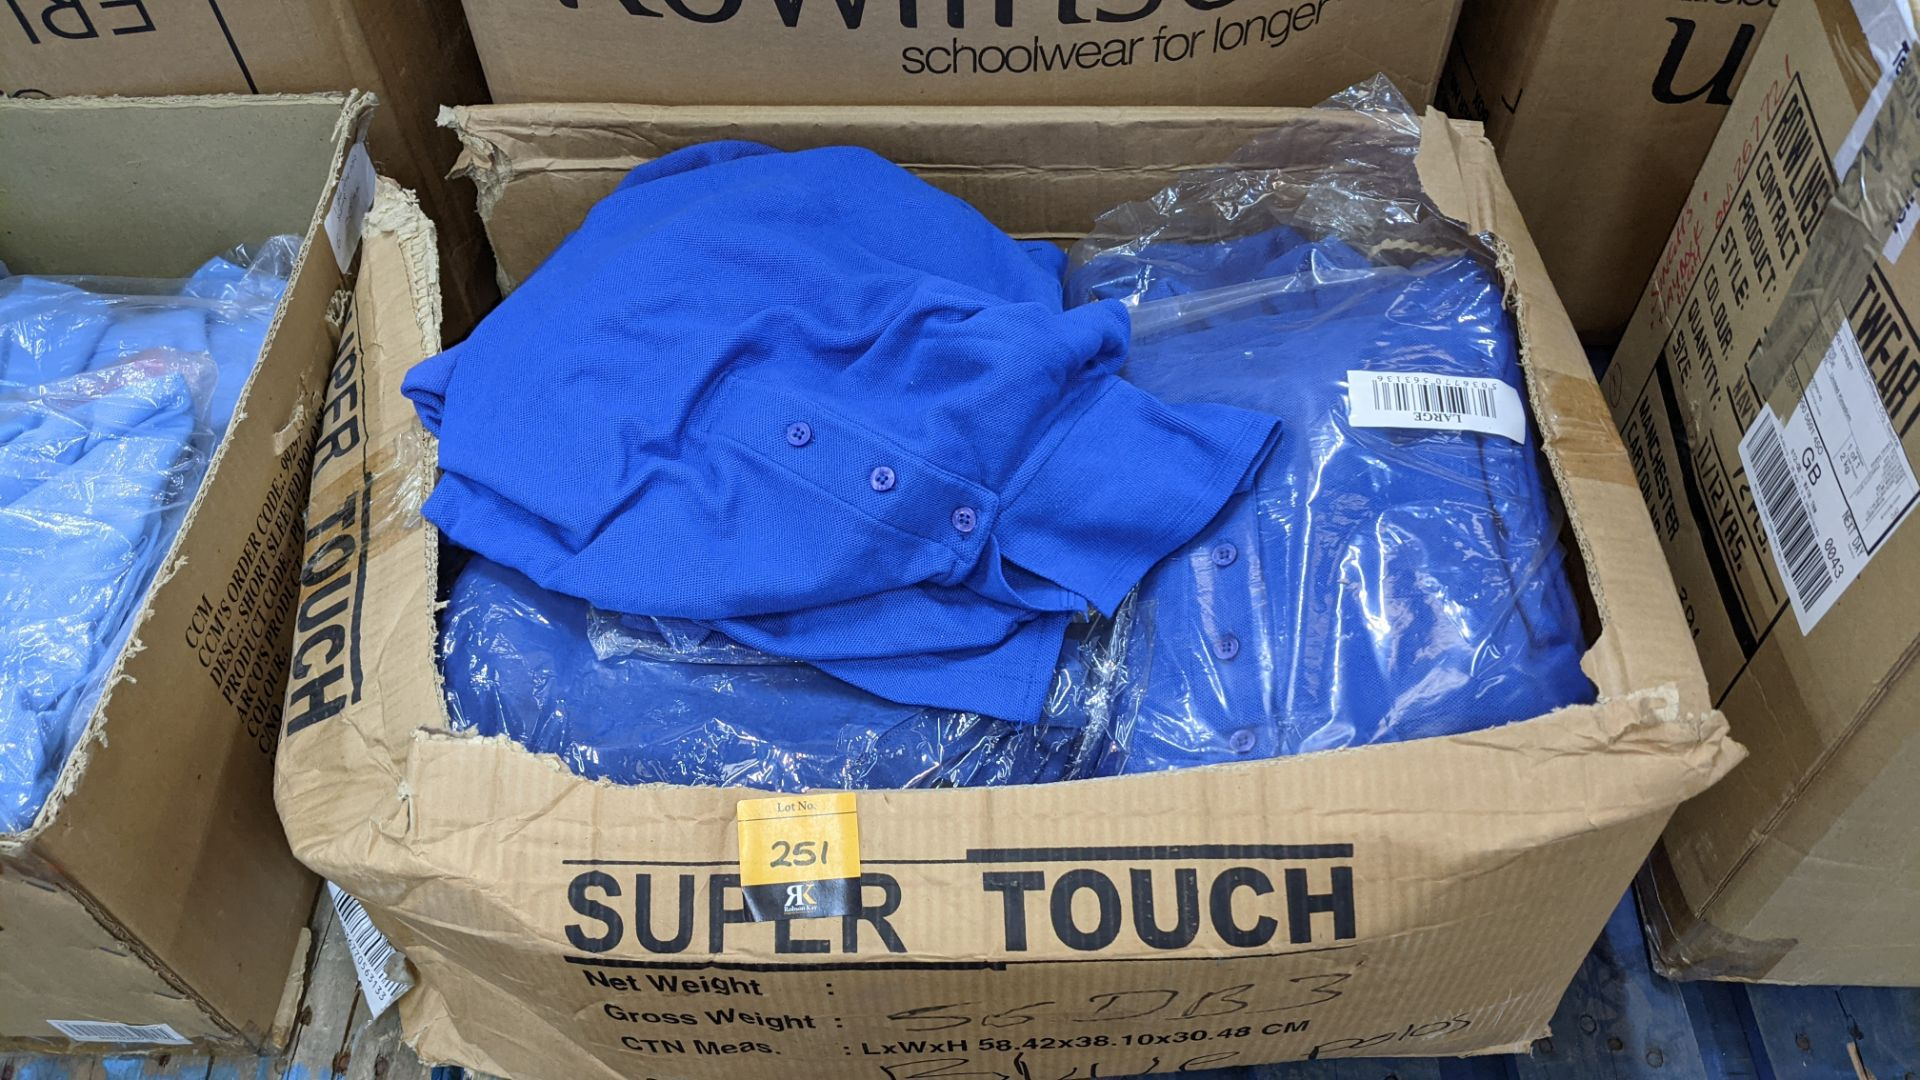 Quantity of royal blue polo shirts - 1 box - Image 2 of 4